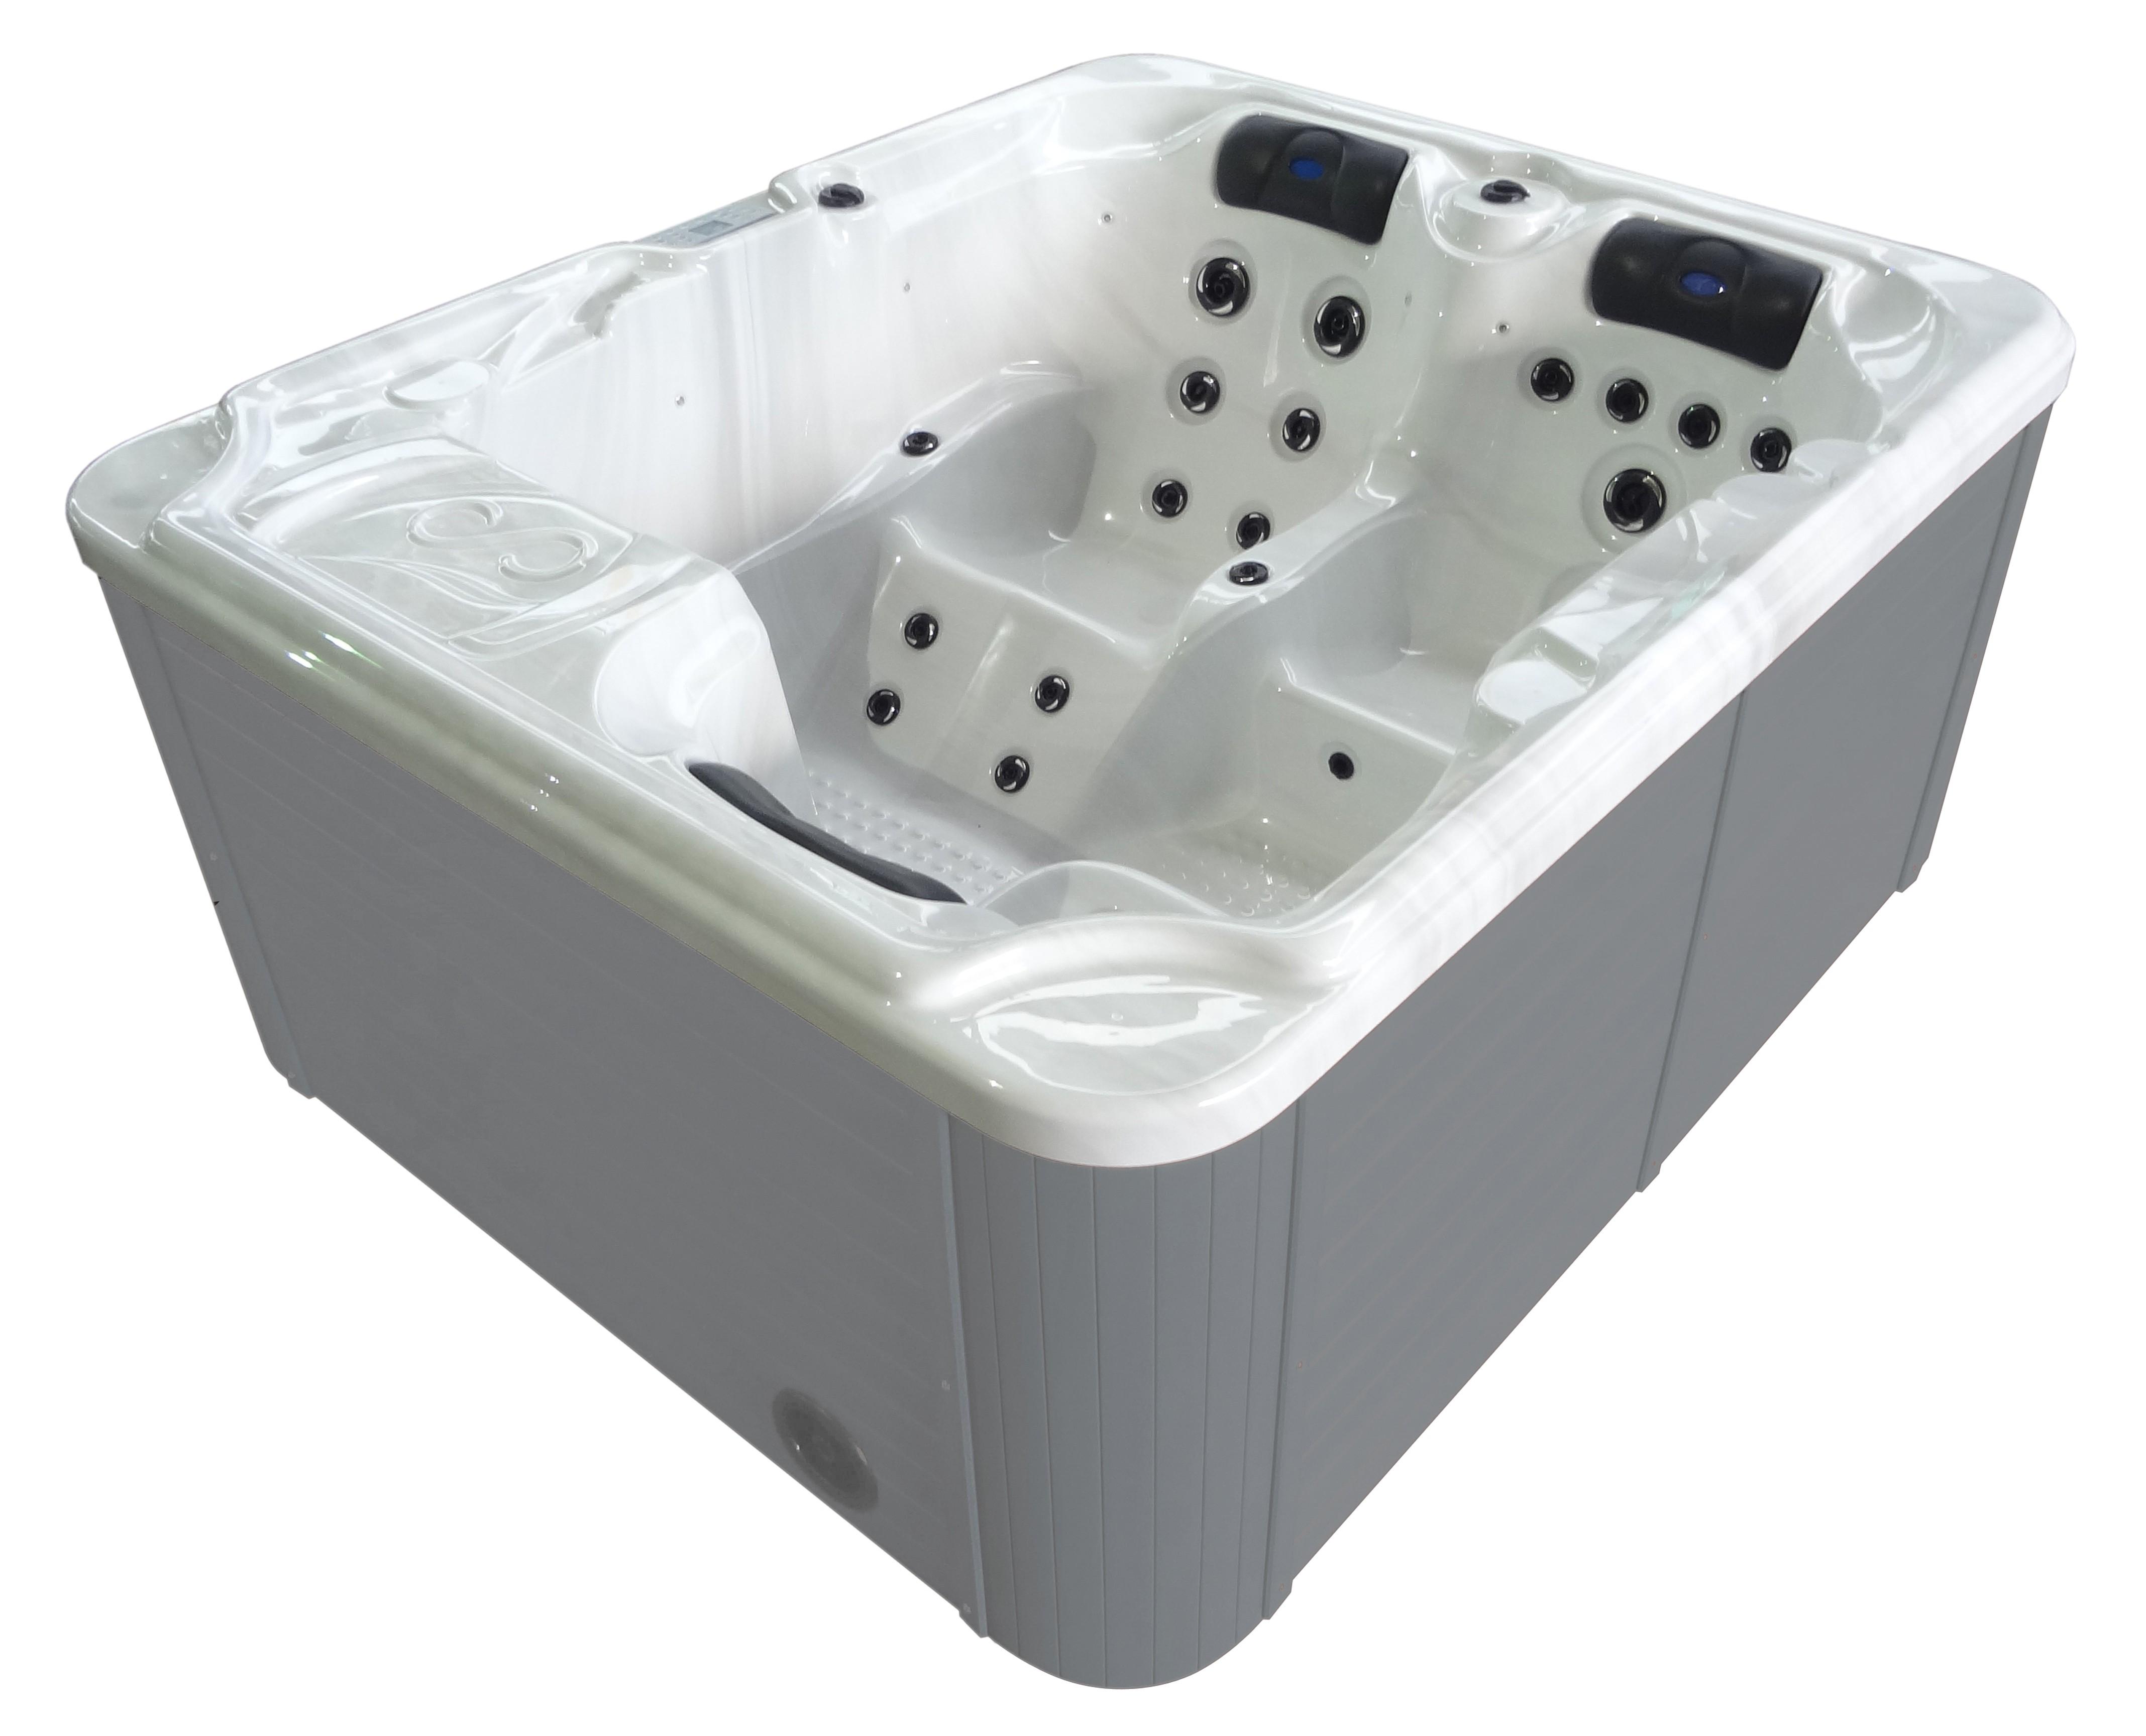 Badstuber Oasis outdoor whirlpool 3-persoons wit